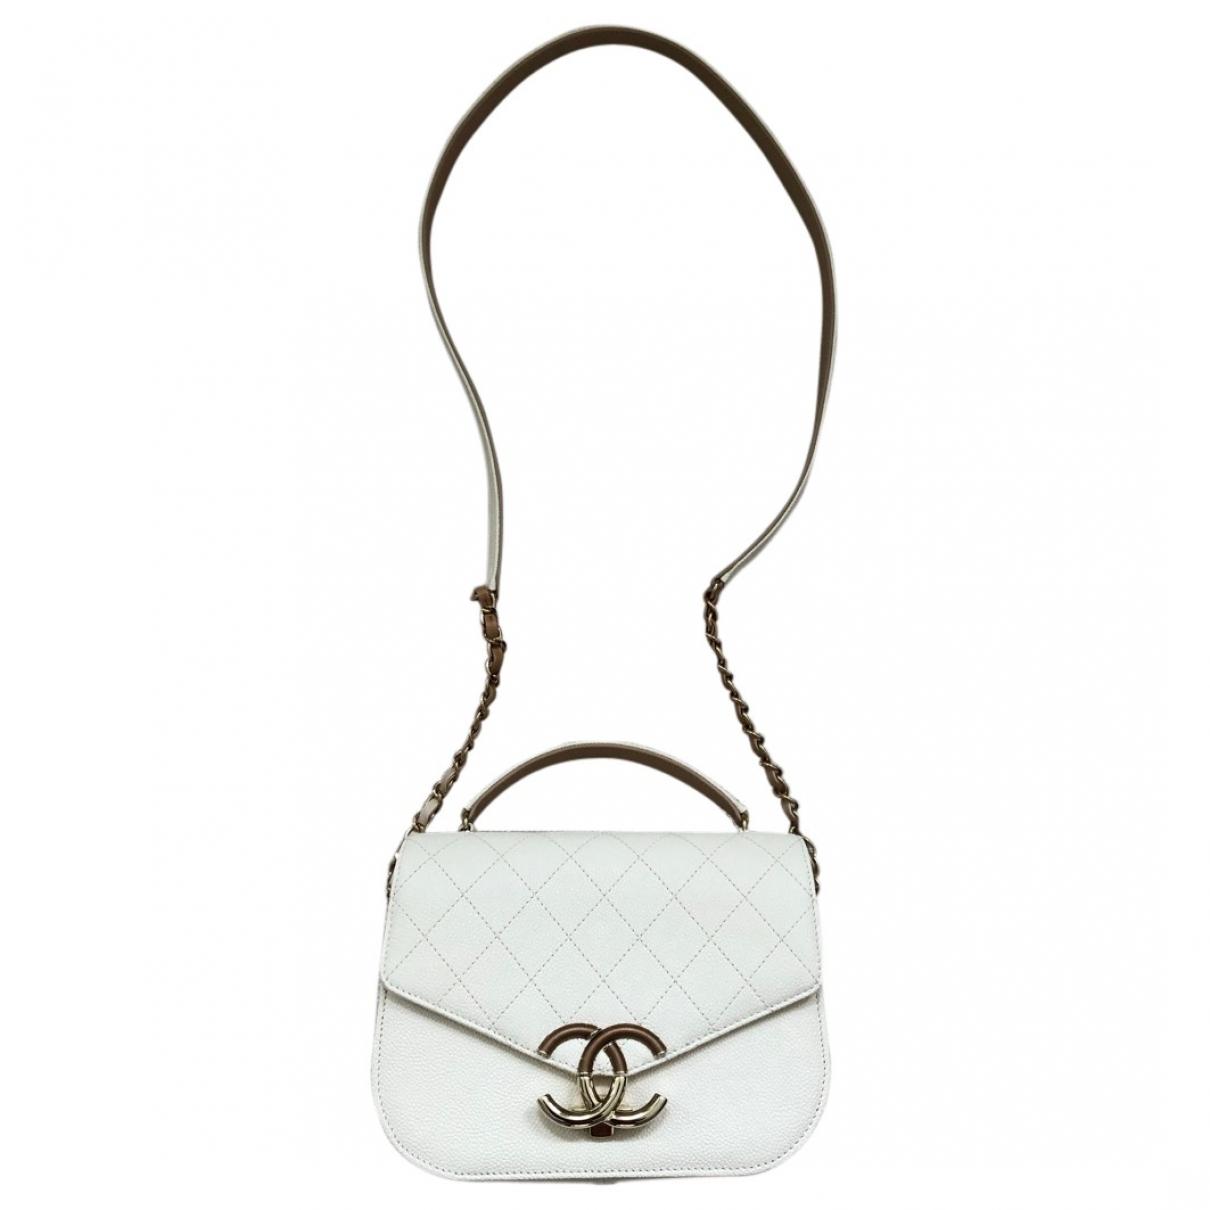 Chanel - Sac a main   pour femme en cuir - ecru